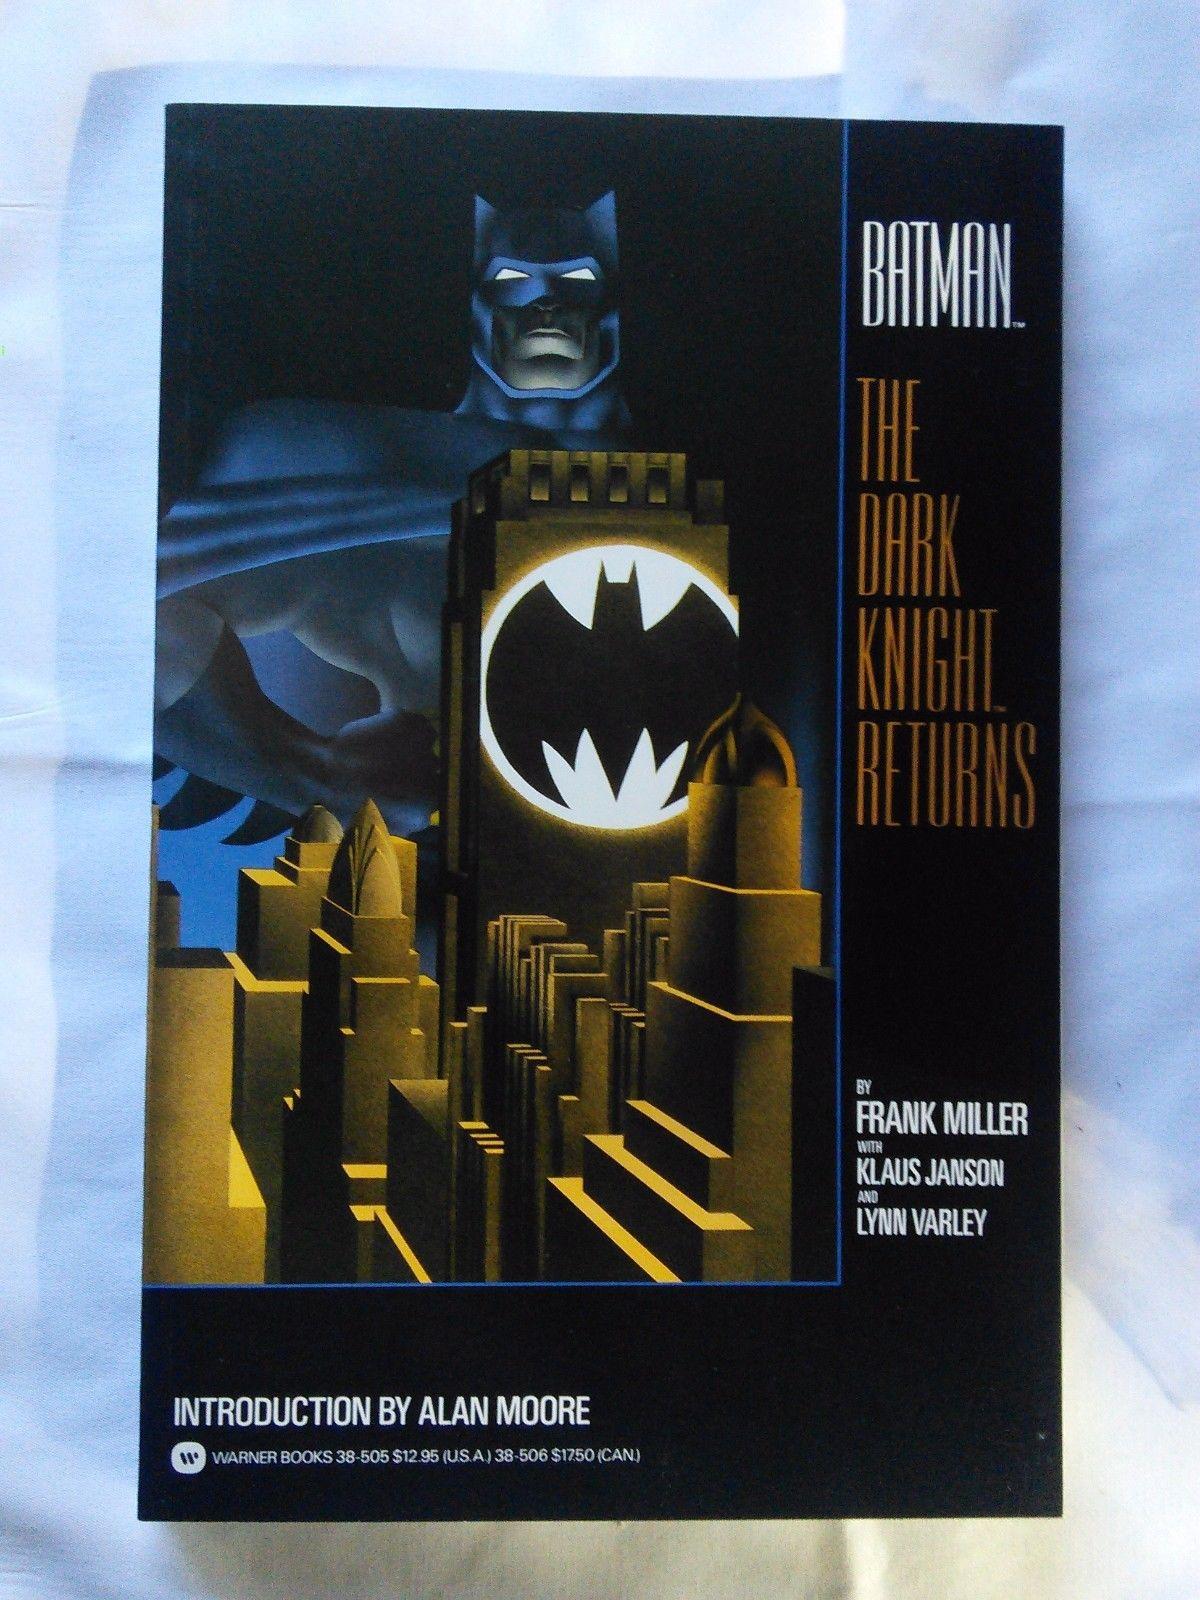 Batman The Dark Knight Returns TPB, first print, NM condition, Frank Miller